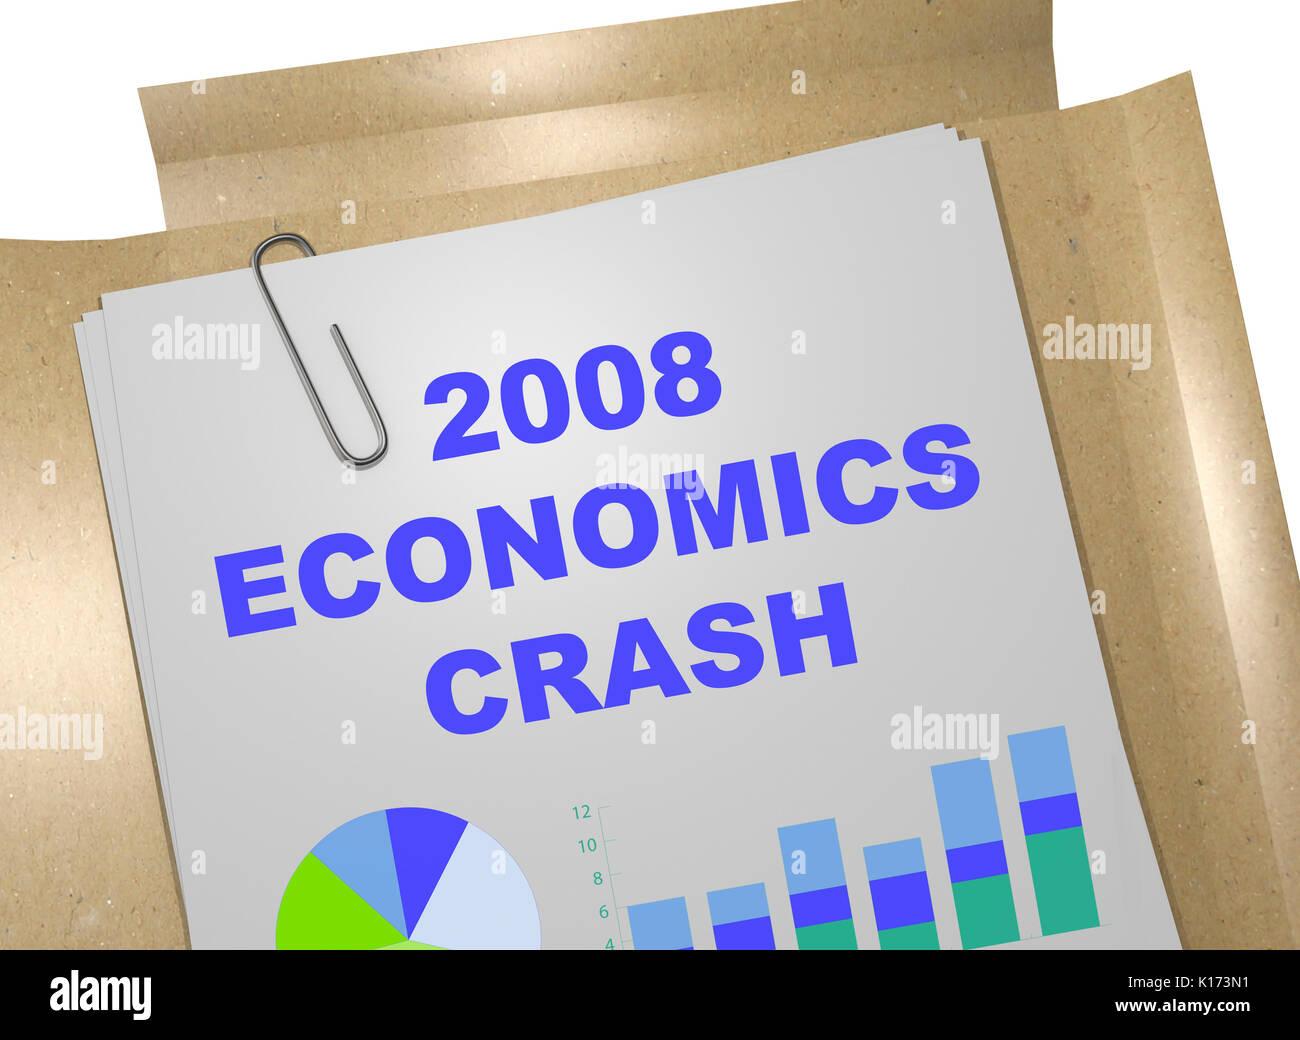 3D illustration of '2008 ECONOMICS CRASH' title on business document - Stock Image